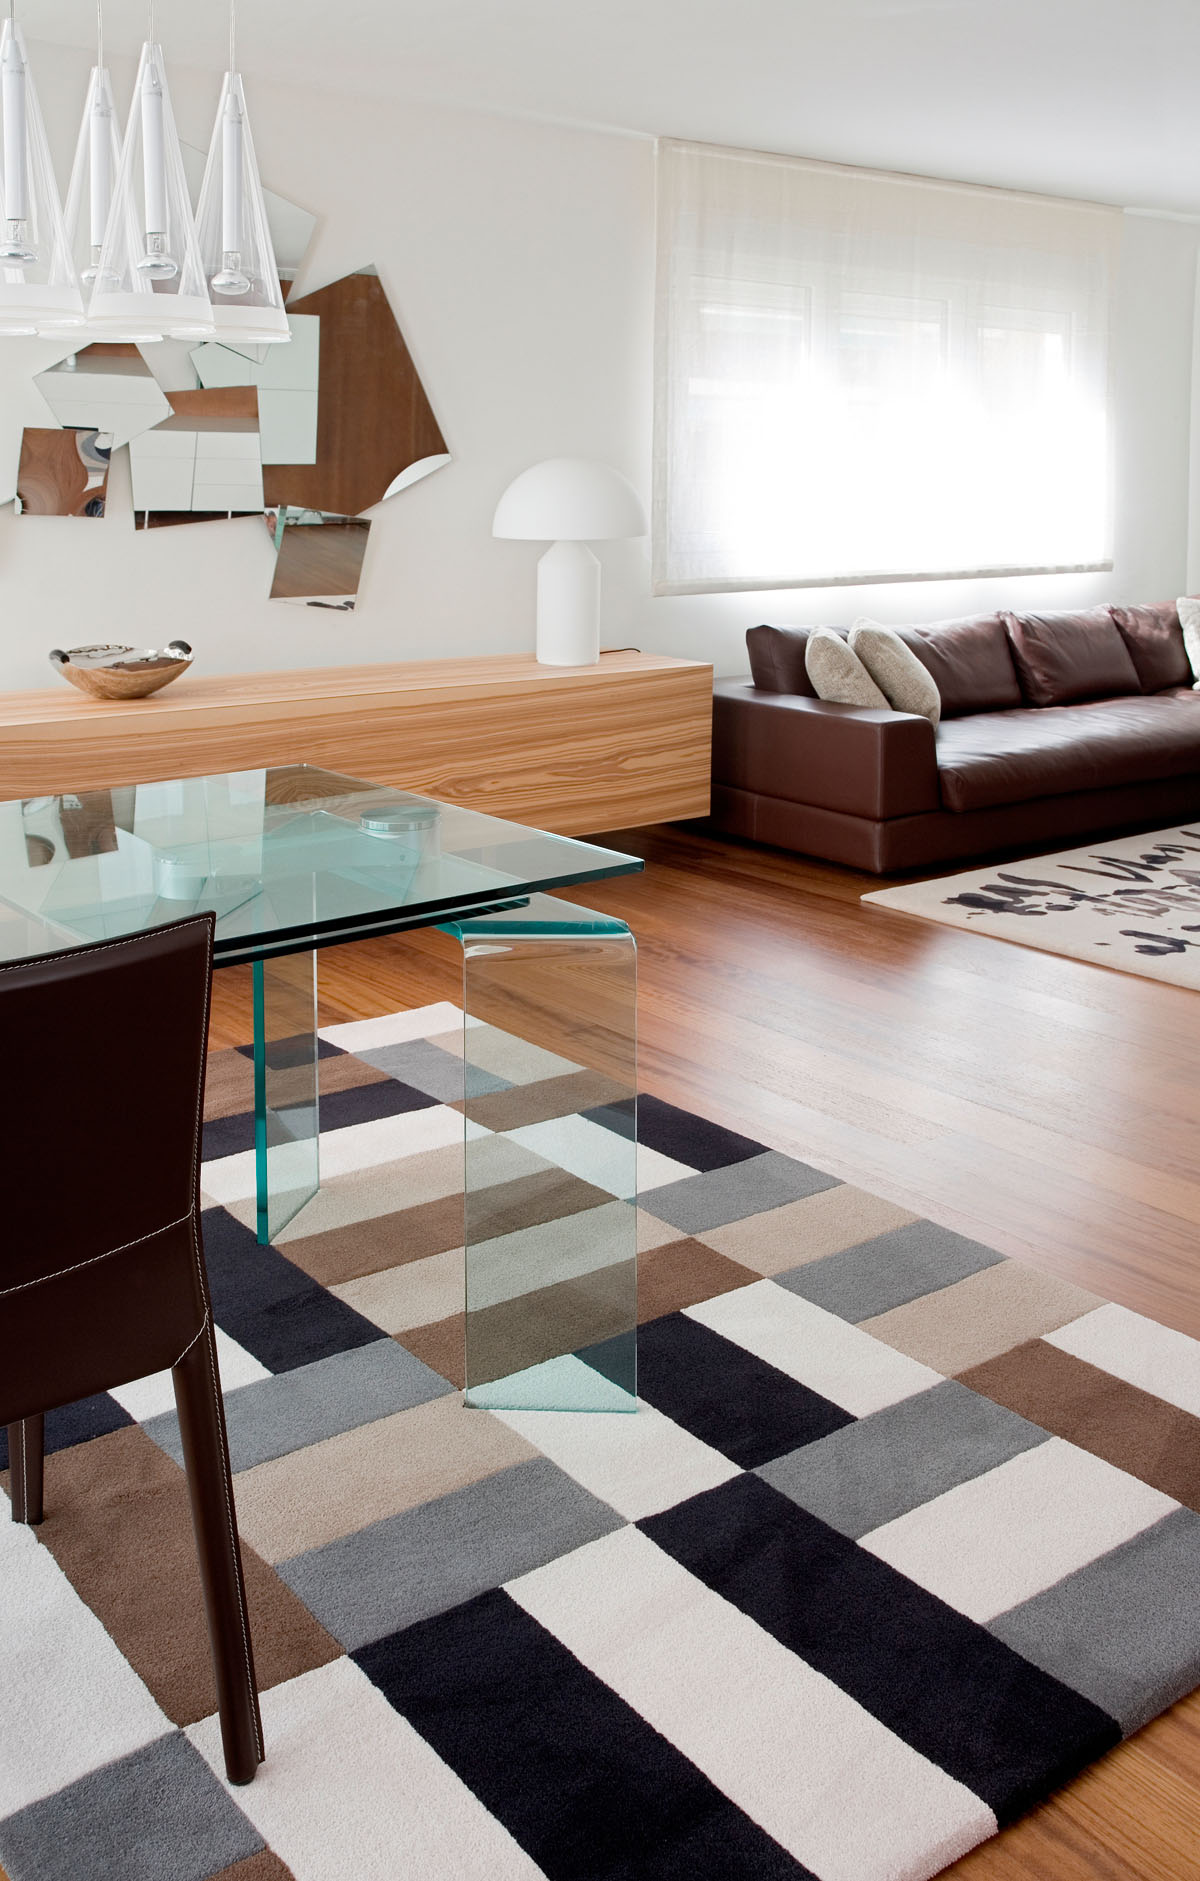 Alpujarre a alfombras de dise o moderno - Alfombras para salones modernos ...